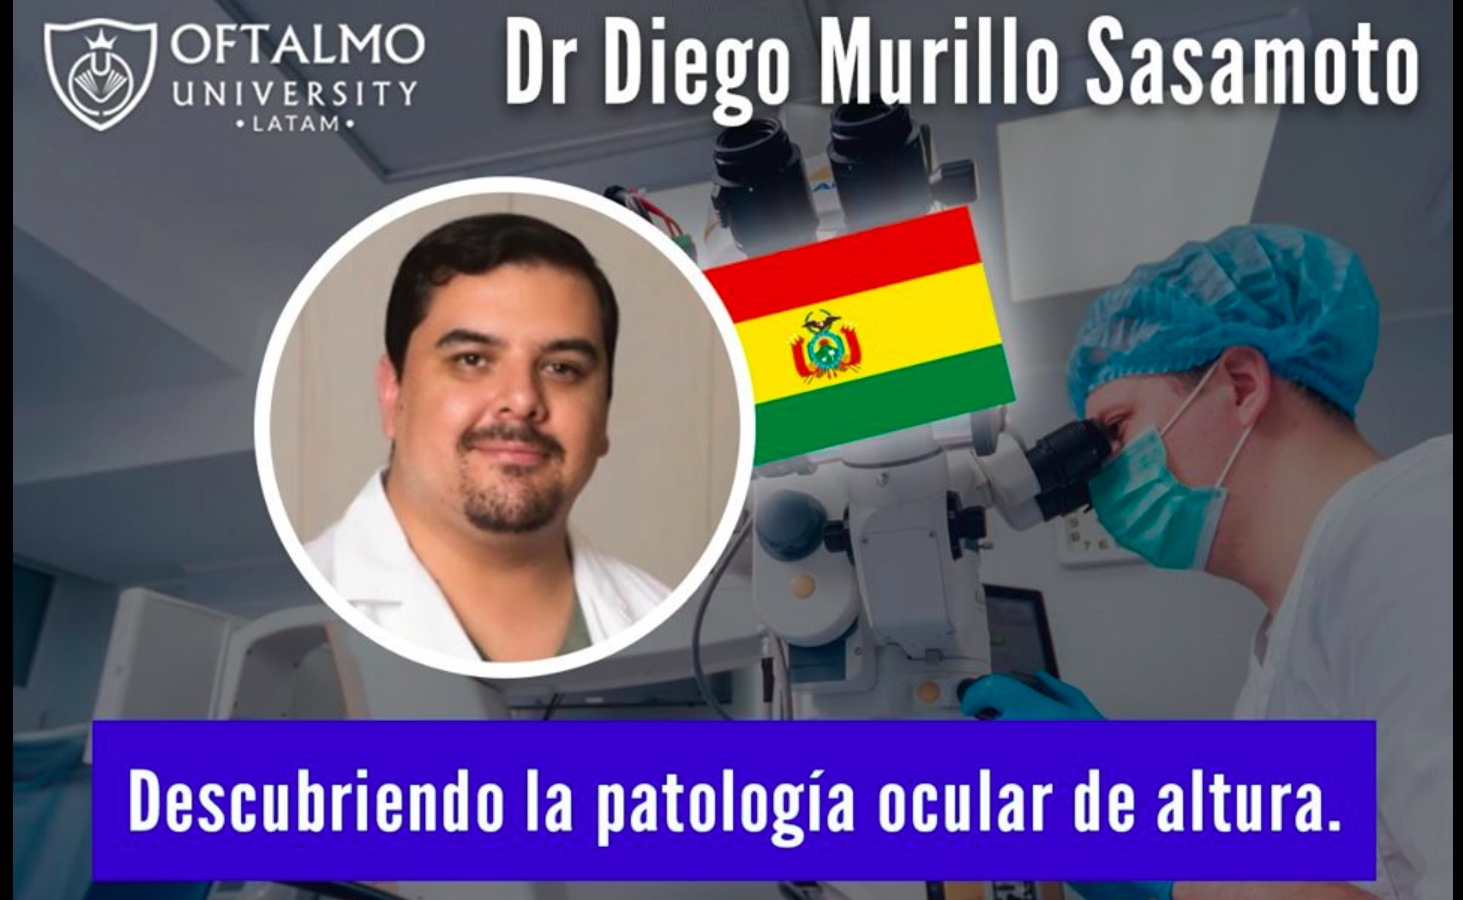 Dr Diego Murillo Sasamoto – Descubriendo la patología ocular de altura – T4E3